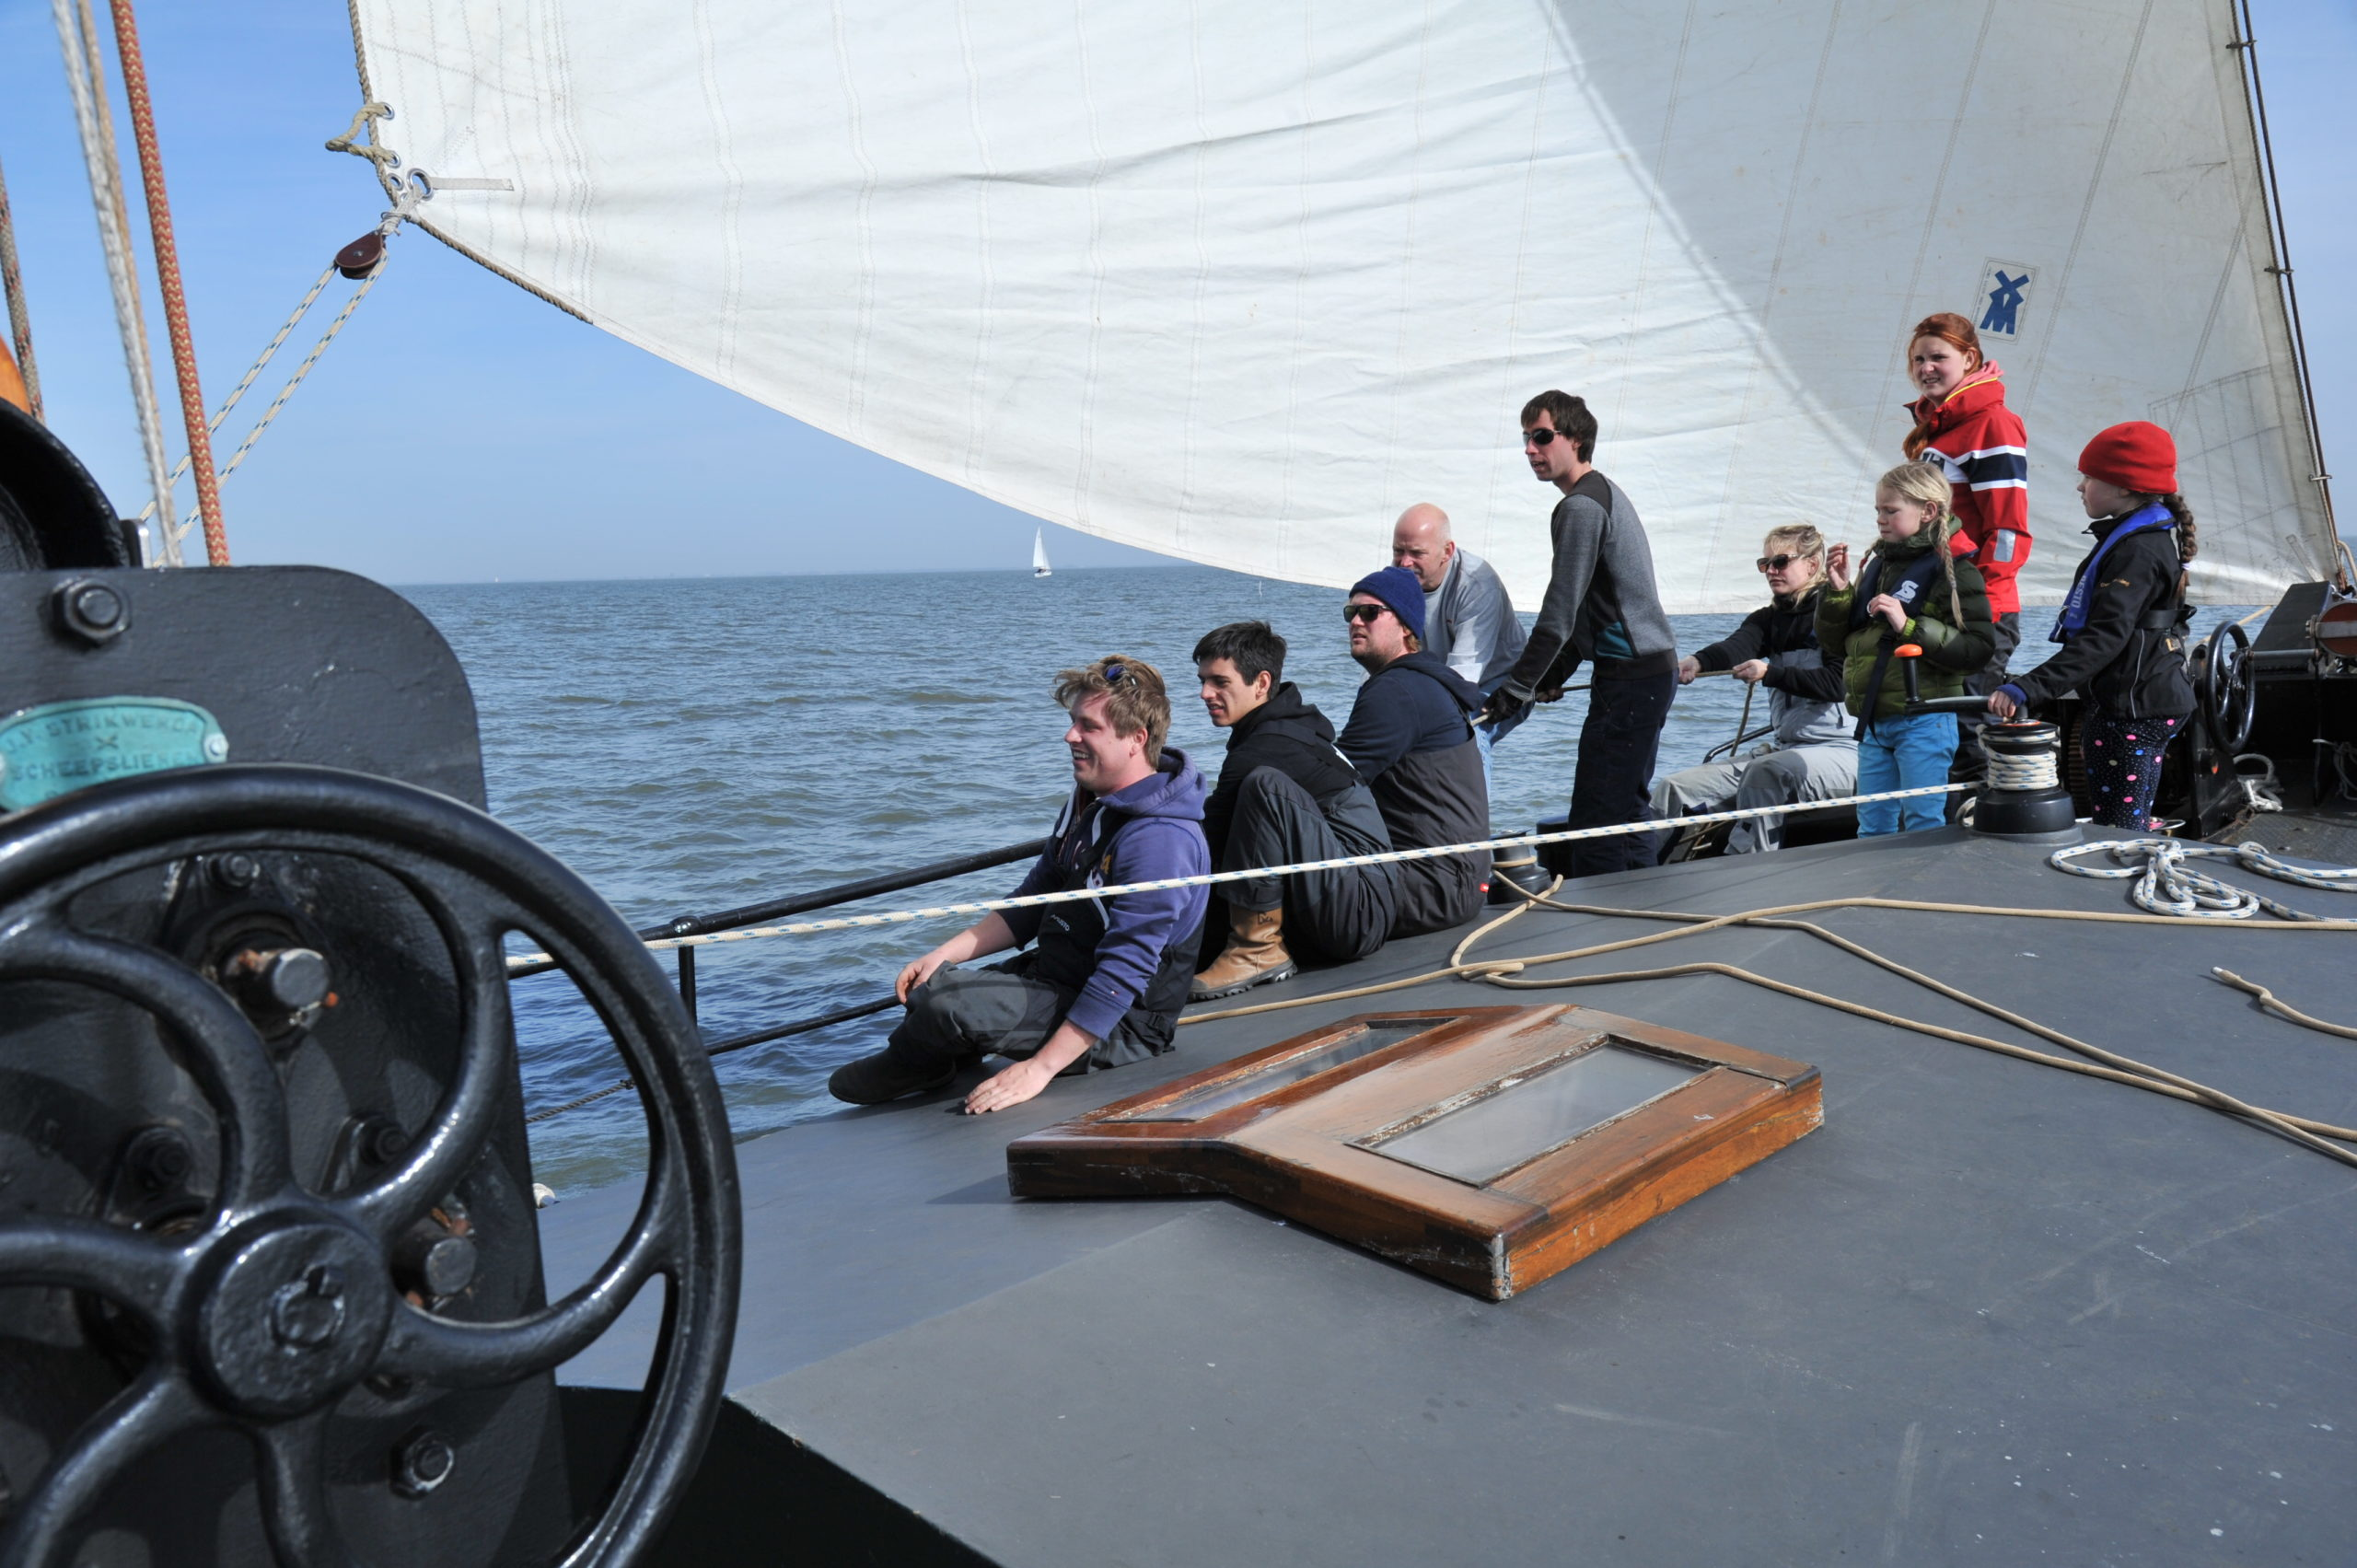 meezeilen Waddenzee @Gouden Vloot Zeilreizen